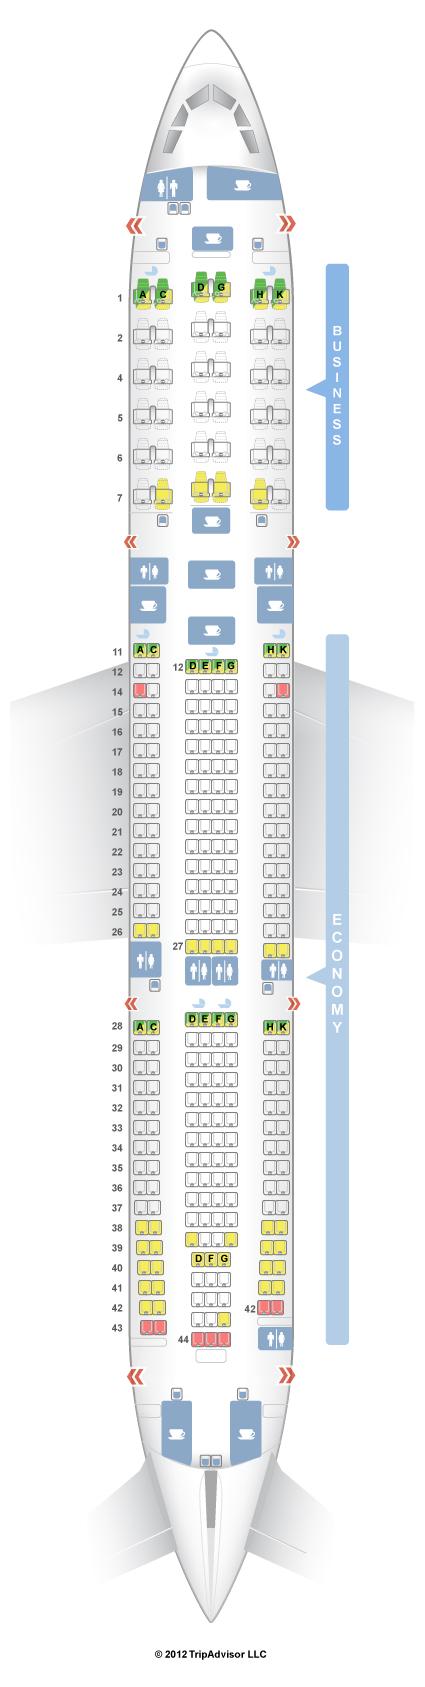 Seatguru Seat Map Malaysia Airlines Airbus A330 300 333